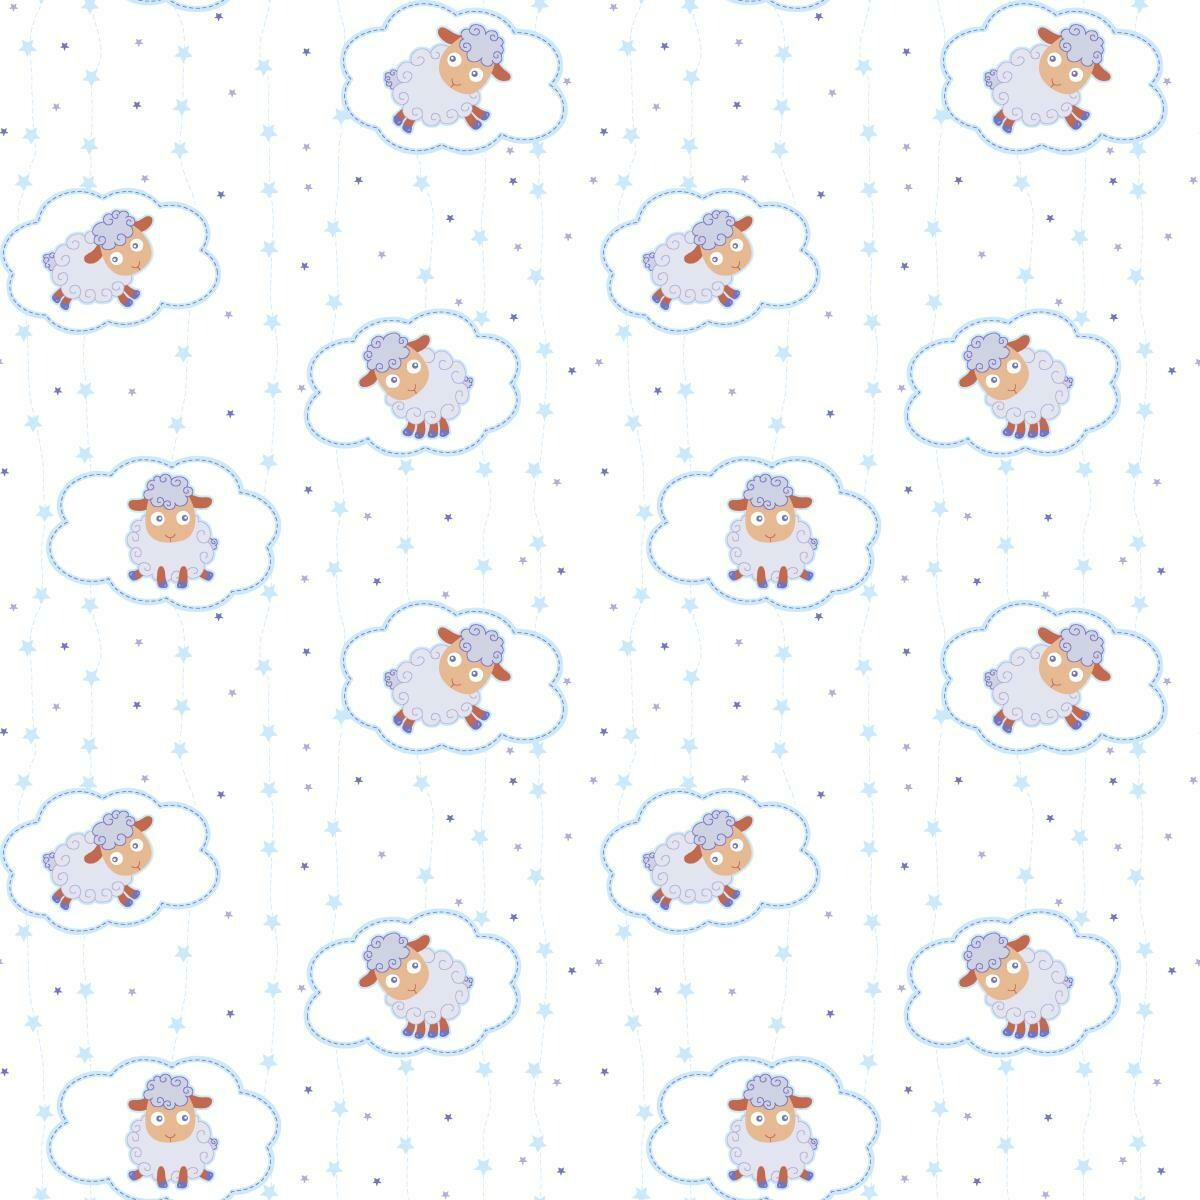 Облачные овечки Ситец 95 см 18784-1